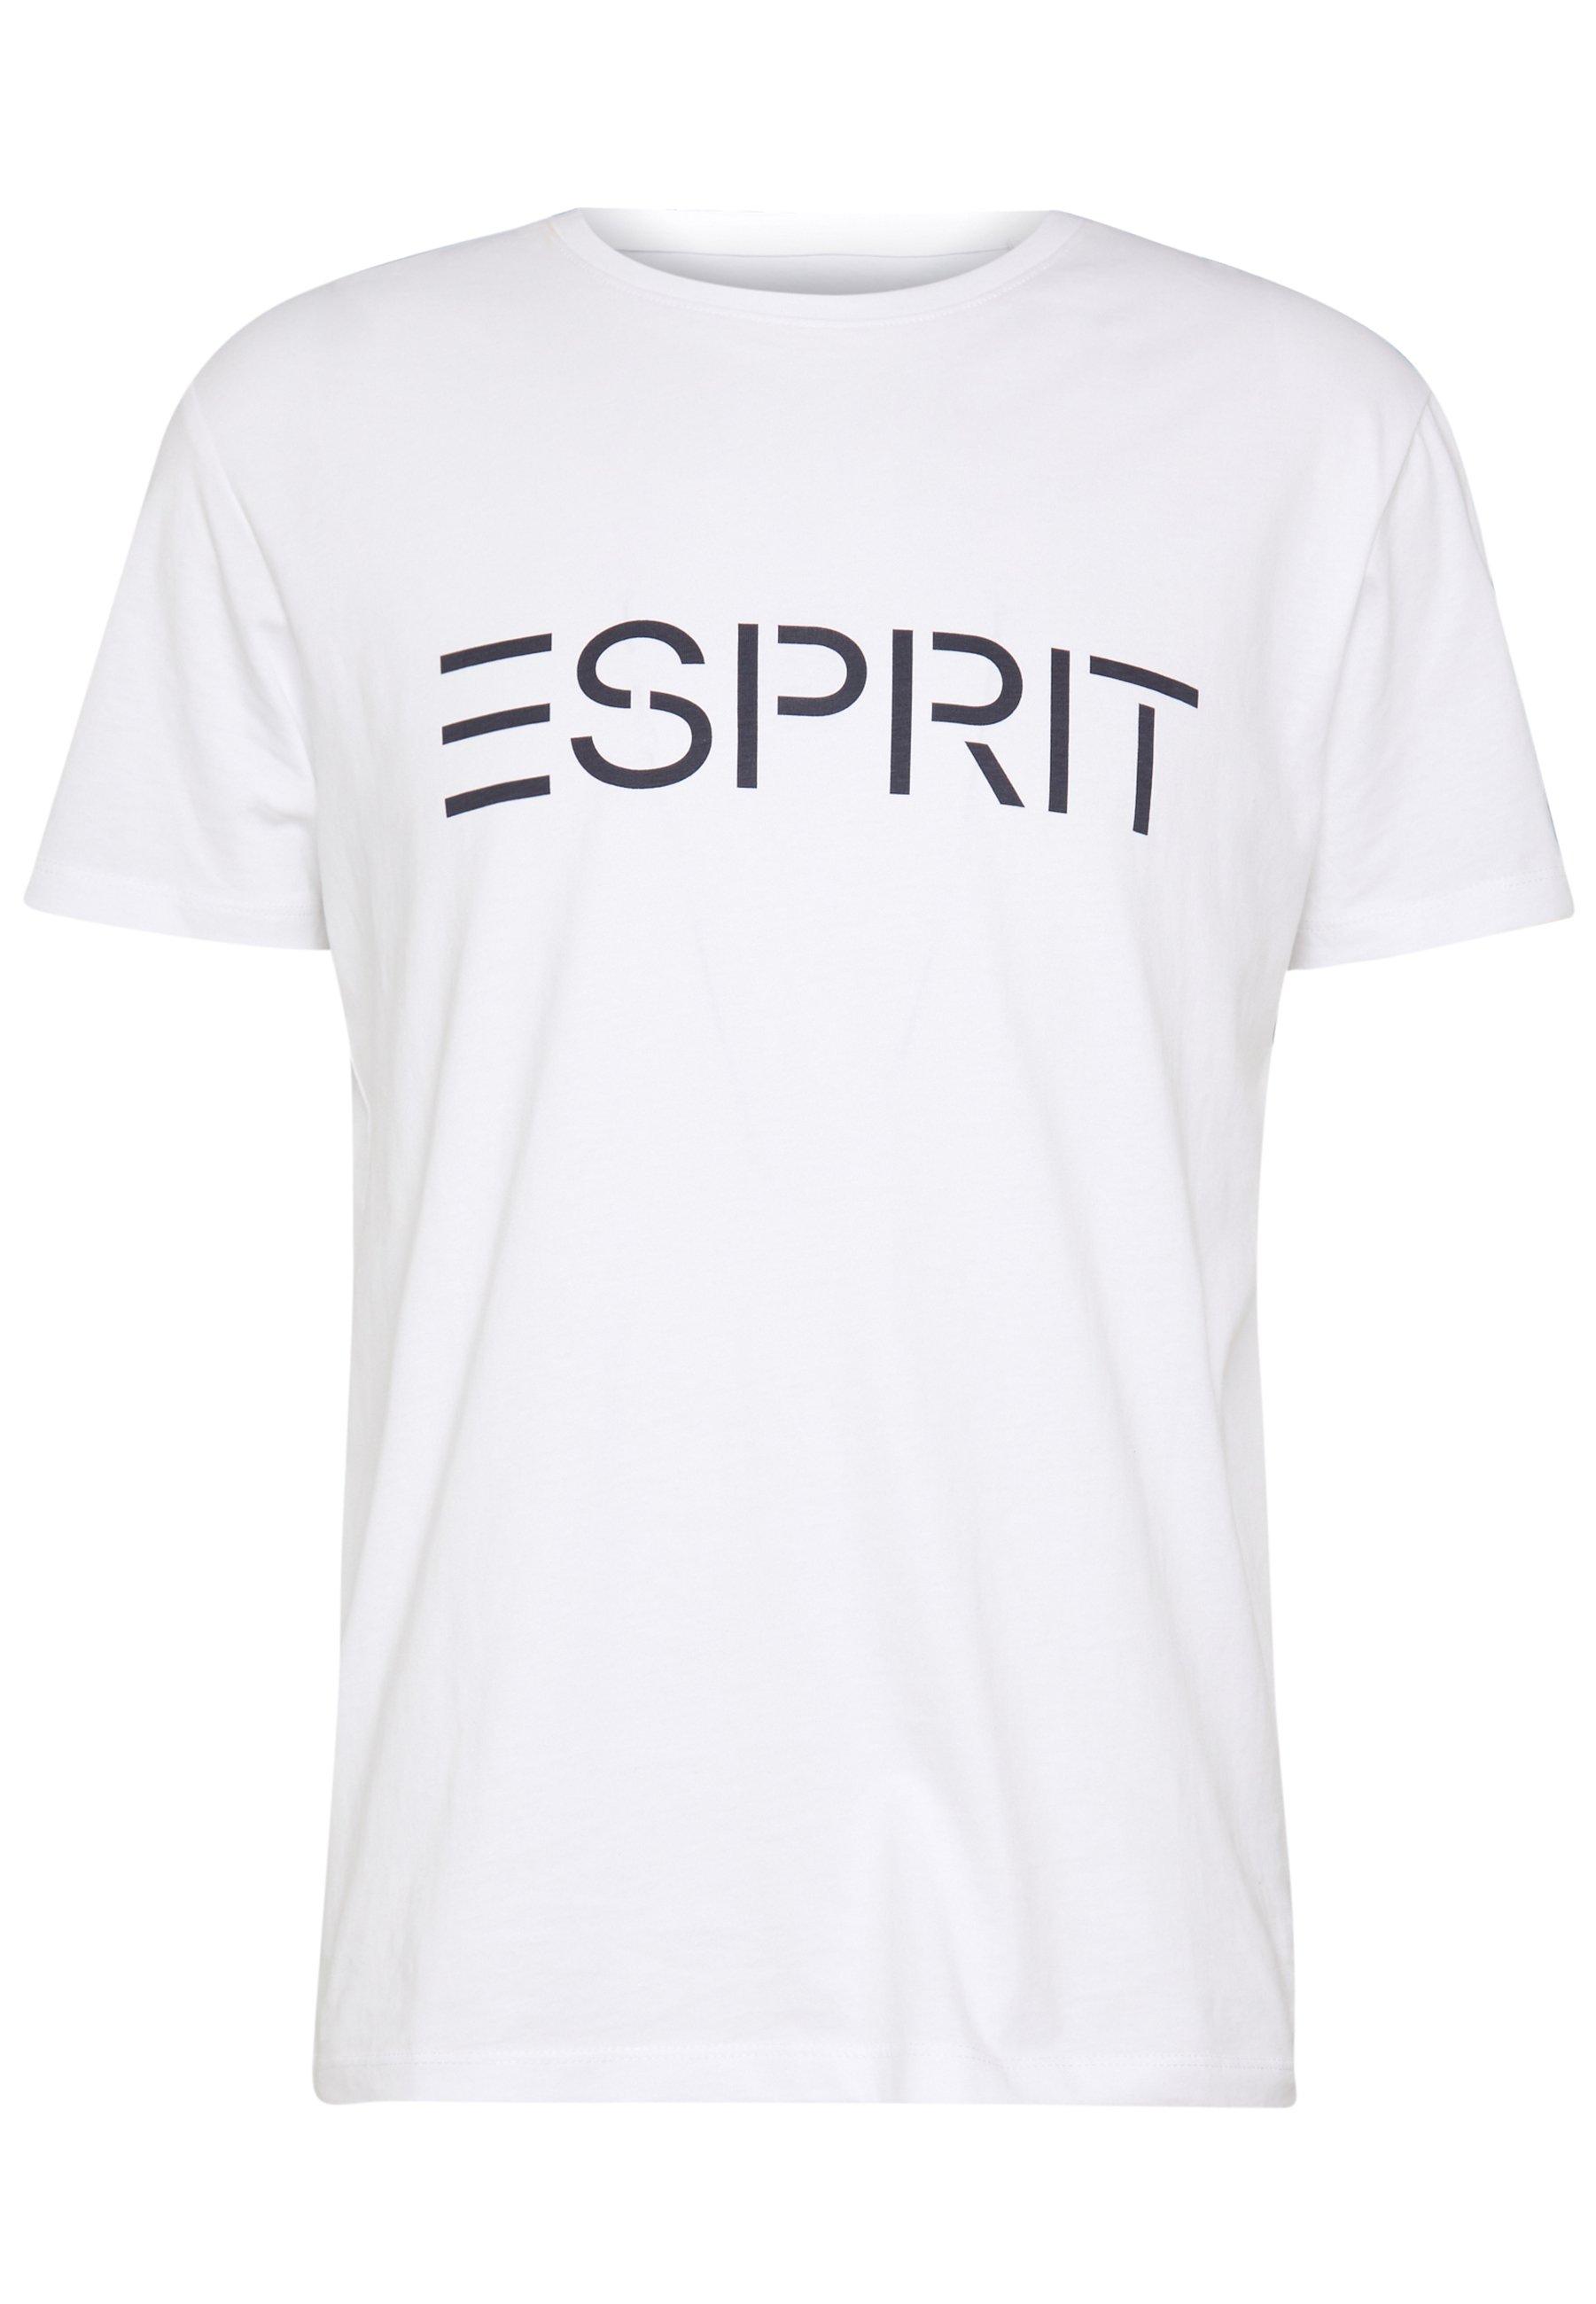 Esprit Logo - T-shirt Print Khaki Green